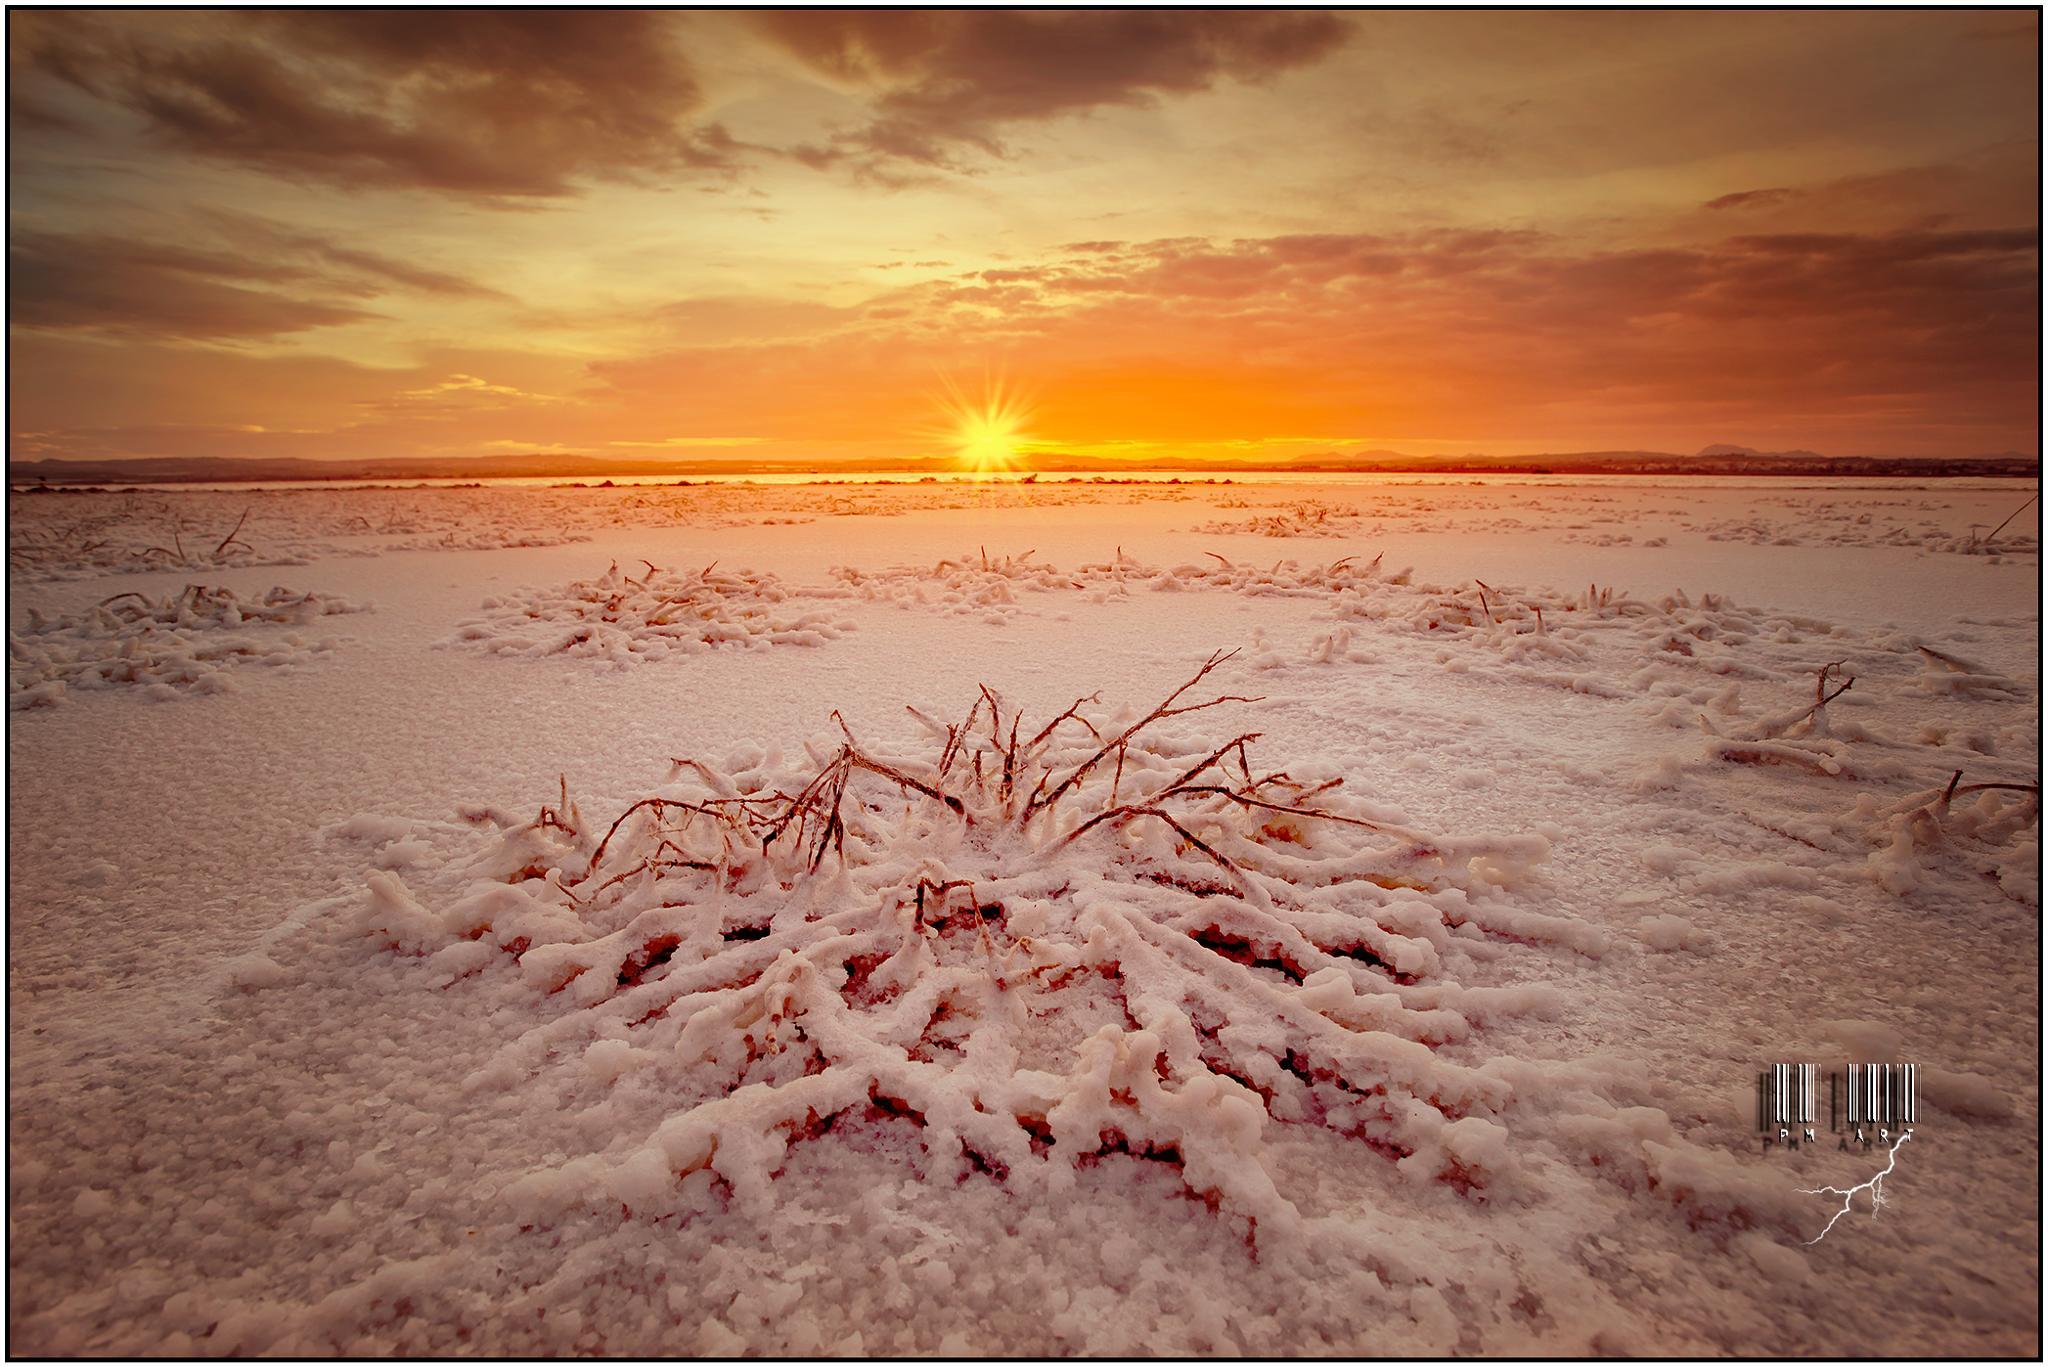 Salt crystallization by Patricio Morales Perez